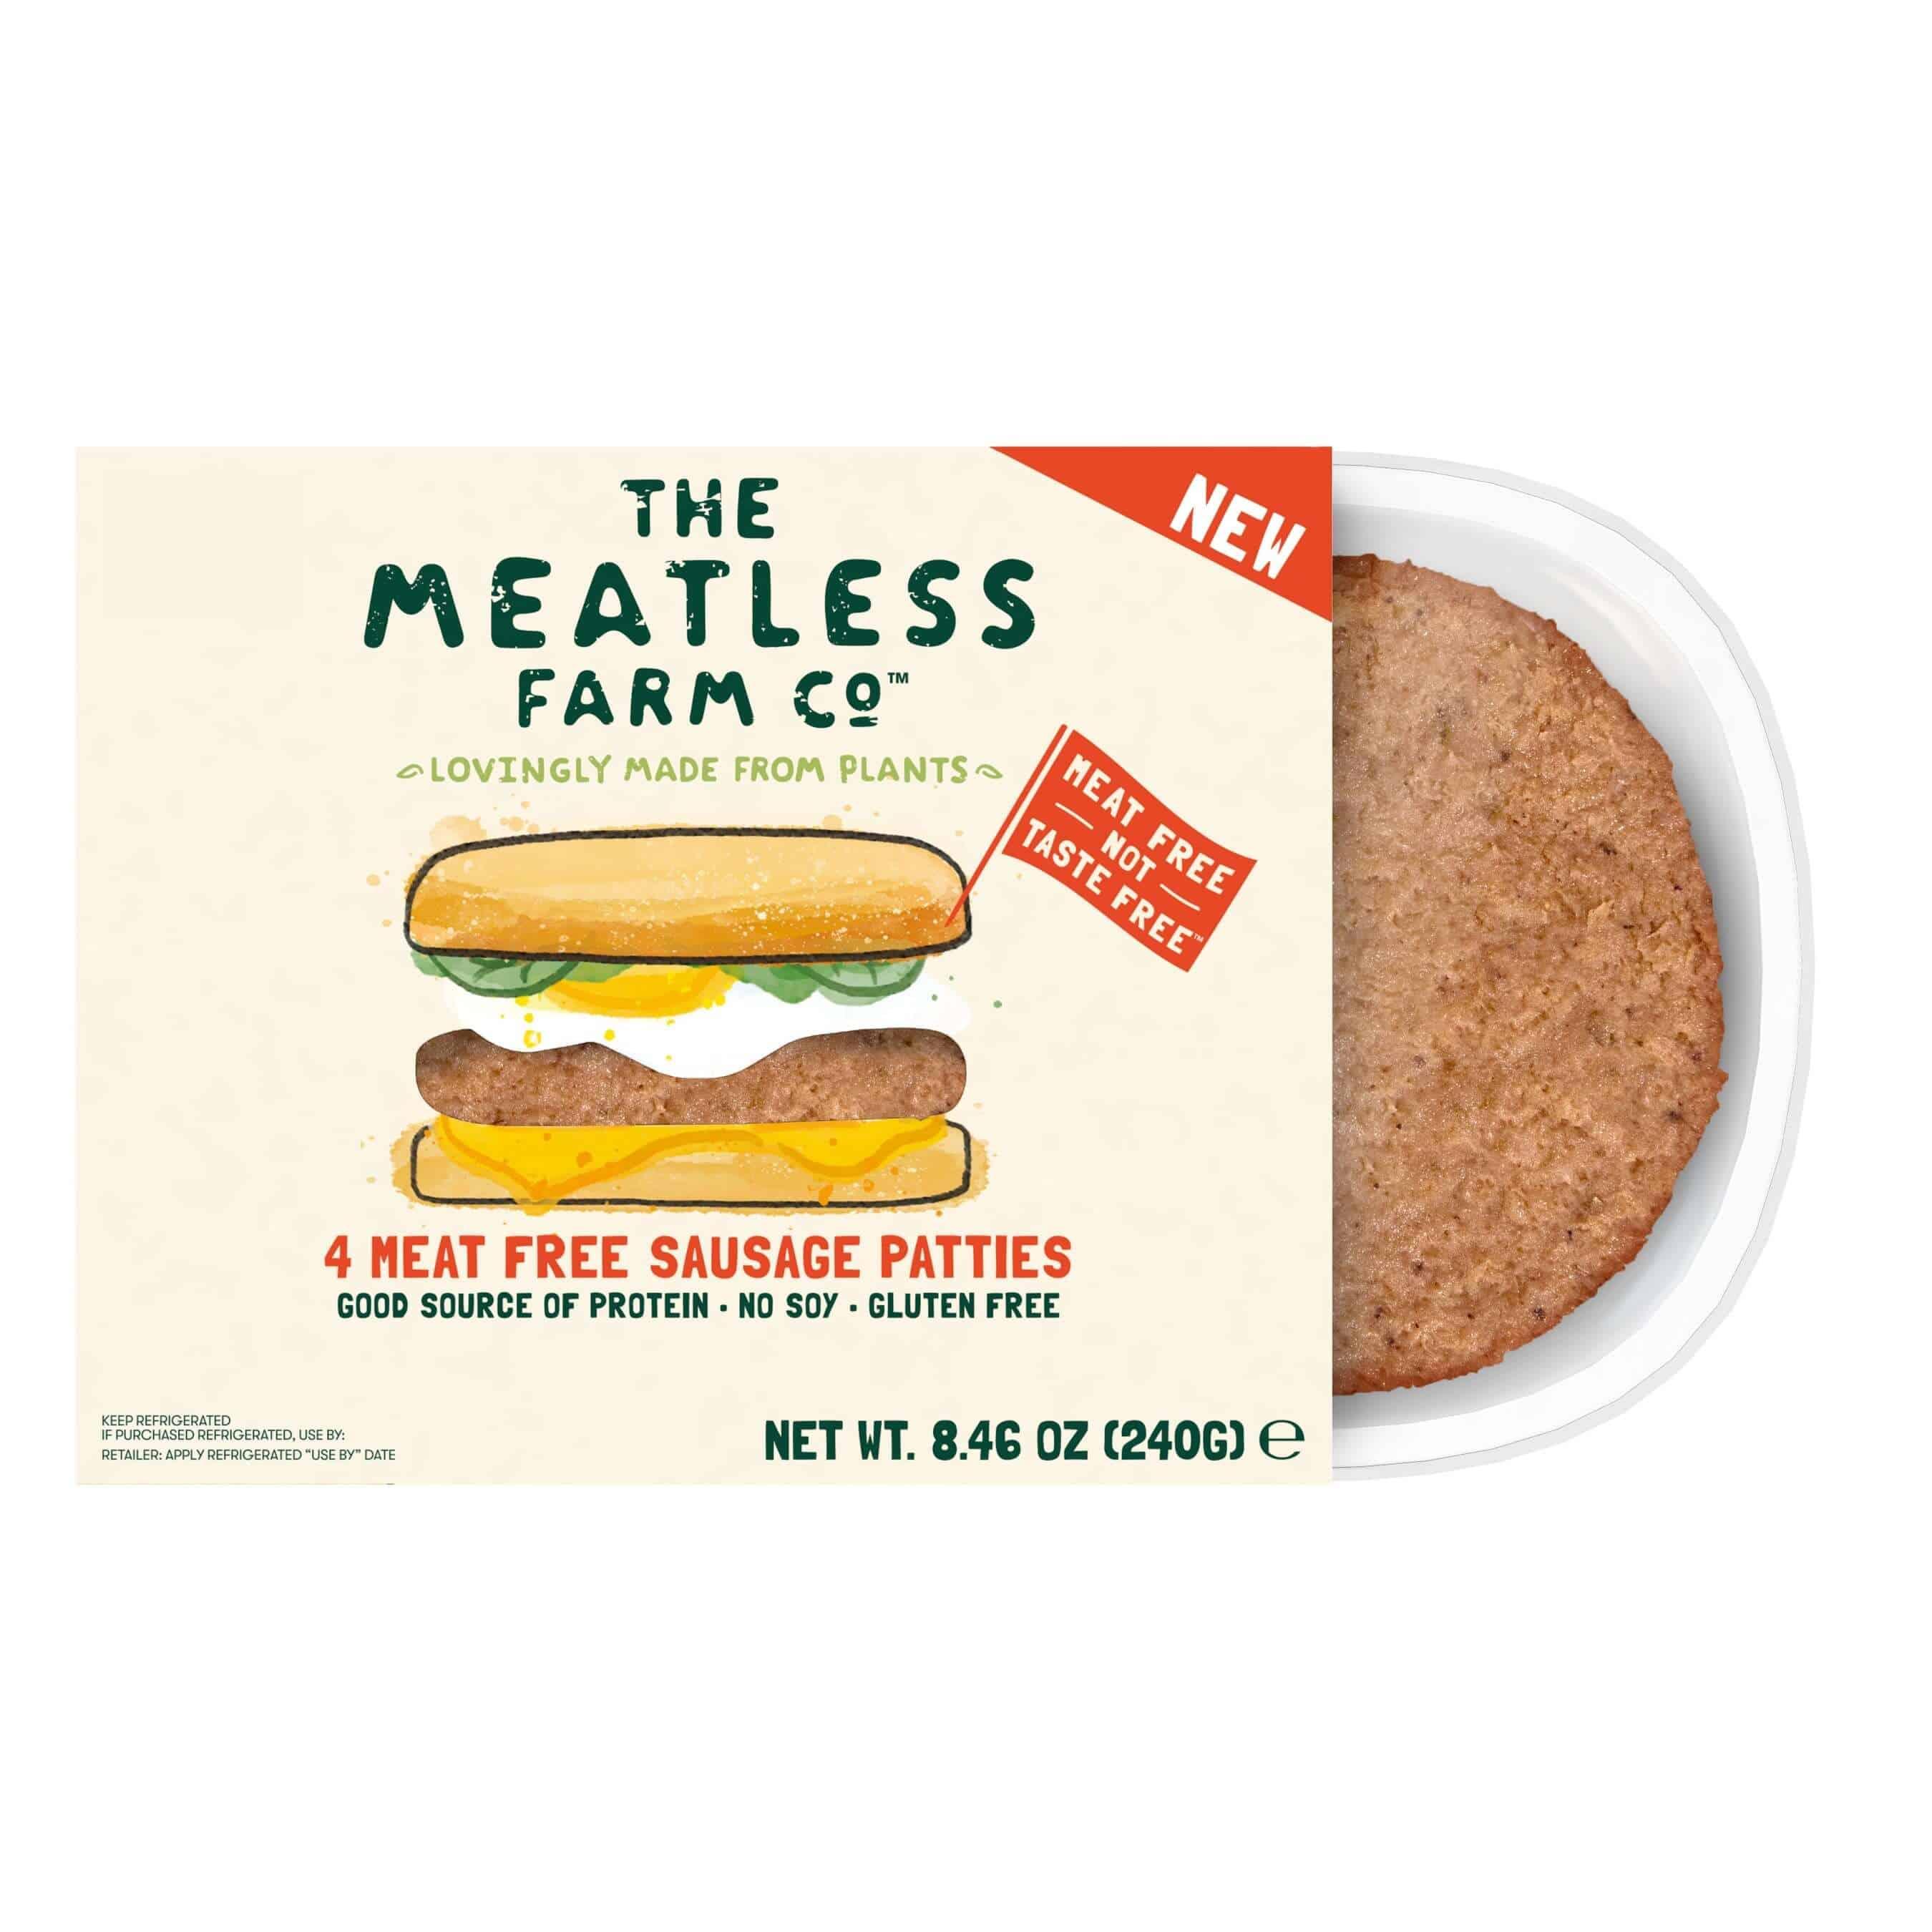 The Meatless Farm Co Breakfast Sausage Patties